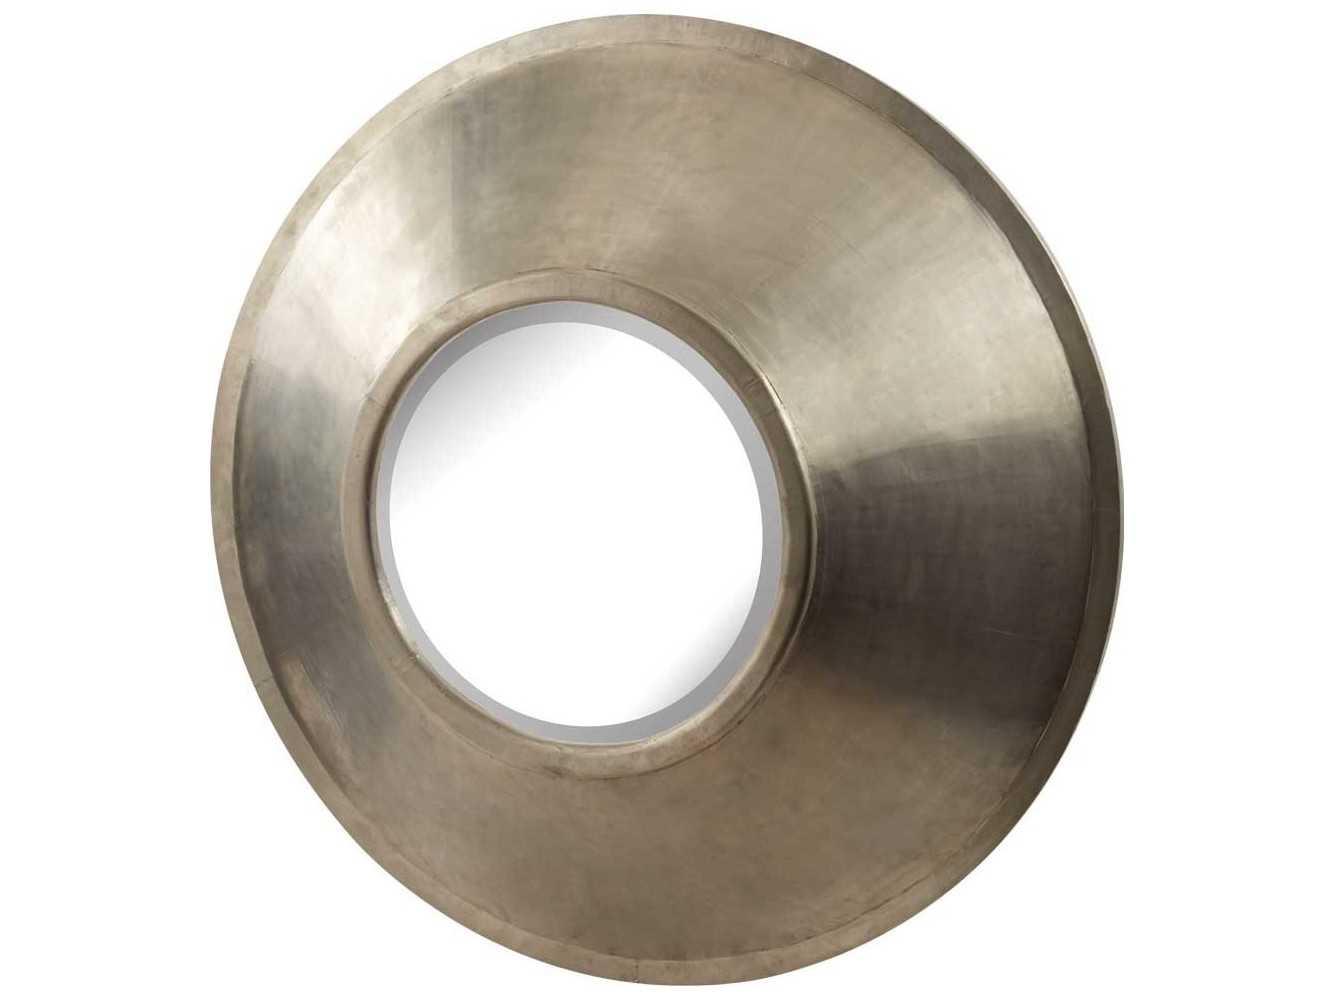 Dimond home 47 round german silver wall mirror ls985040 for Round silver wall mirror